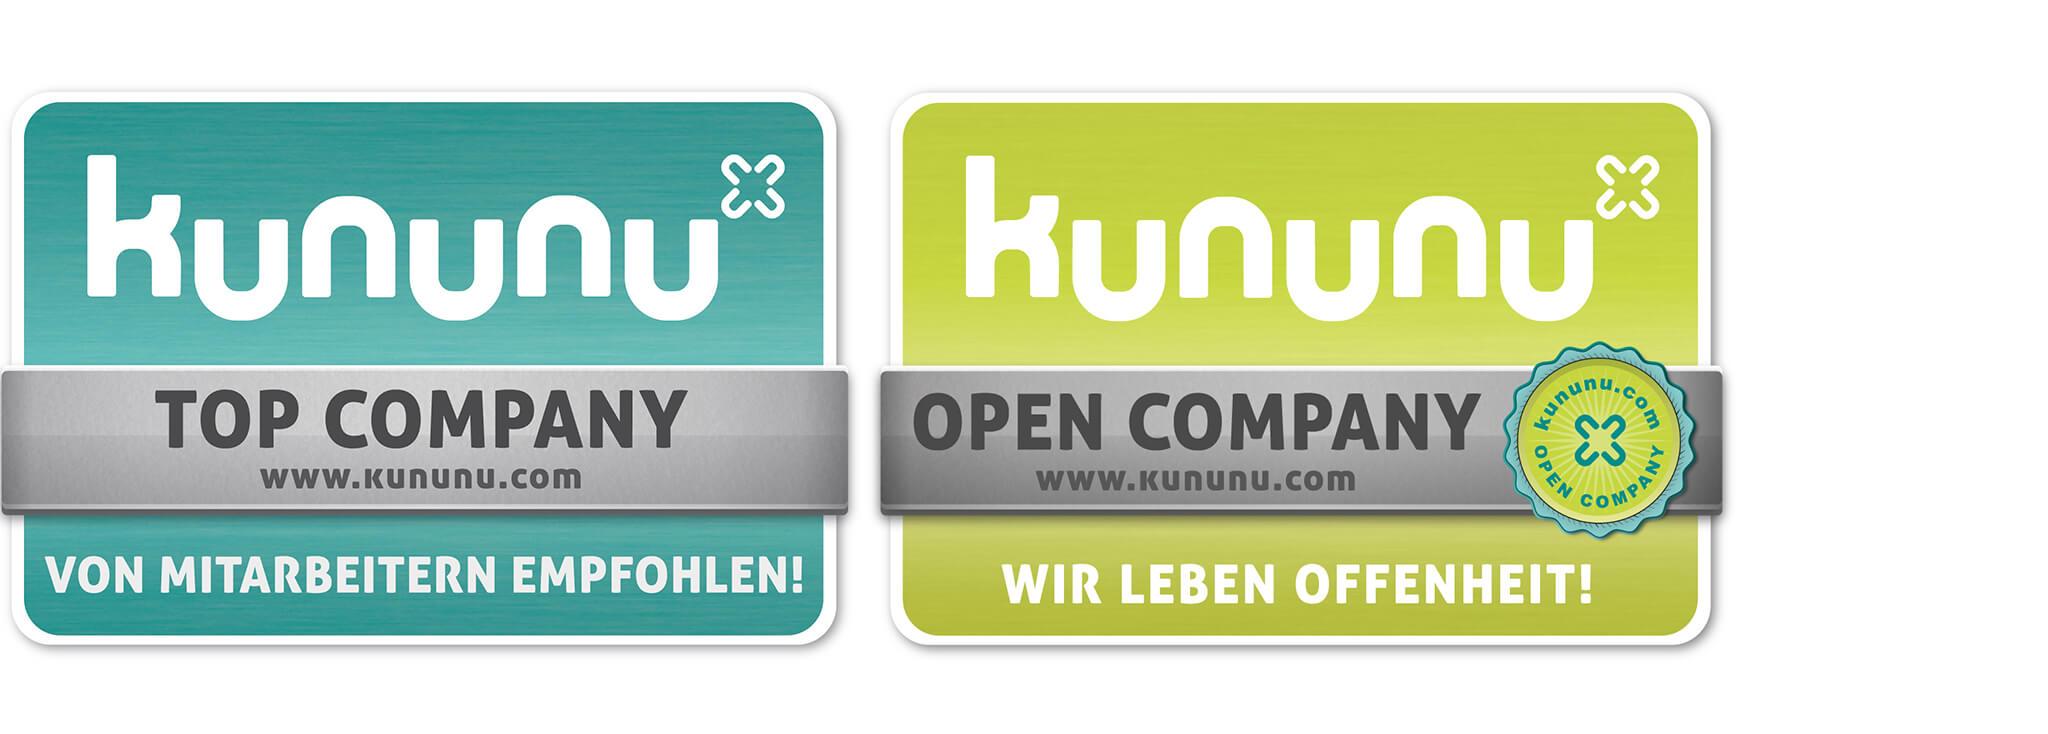 2020-10-29-kununu-top-company-top-arbeitgeber-nl-bild